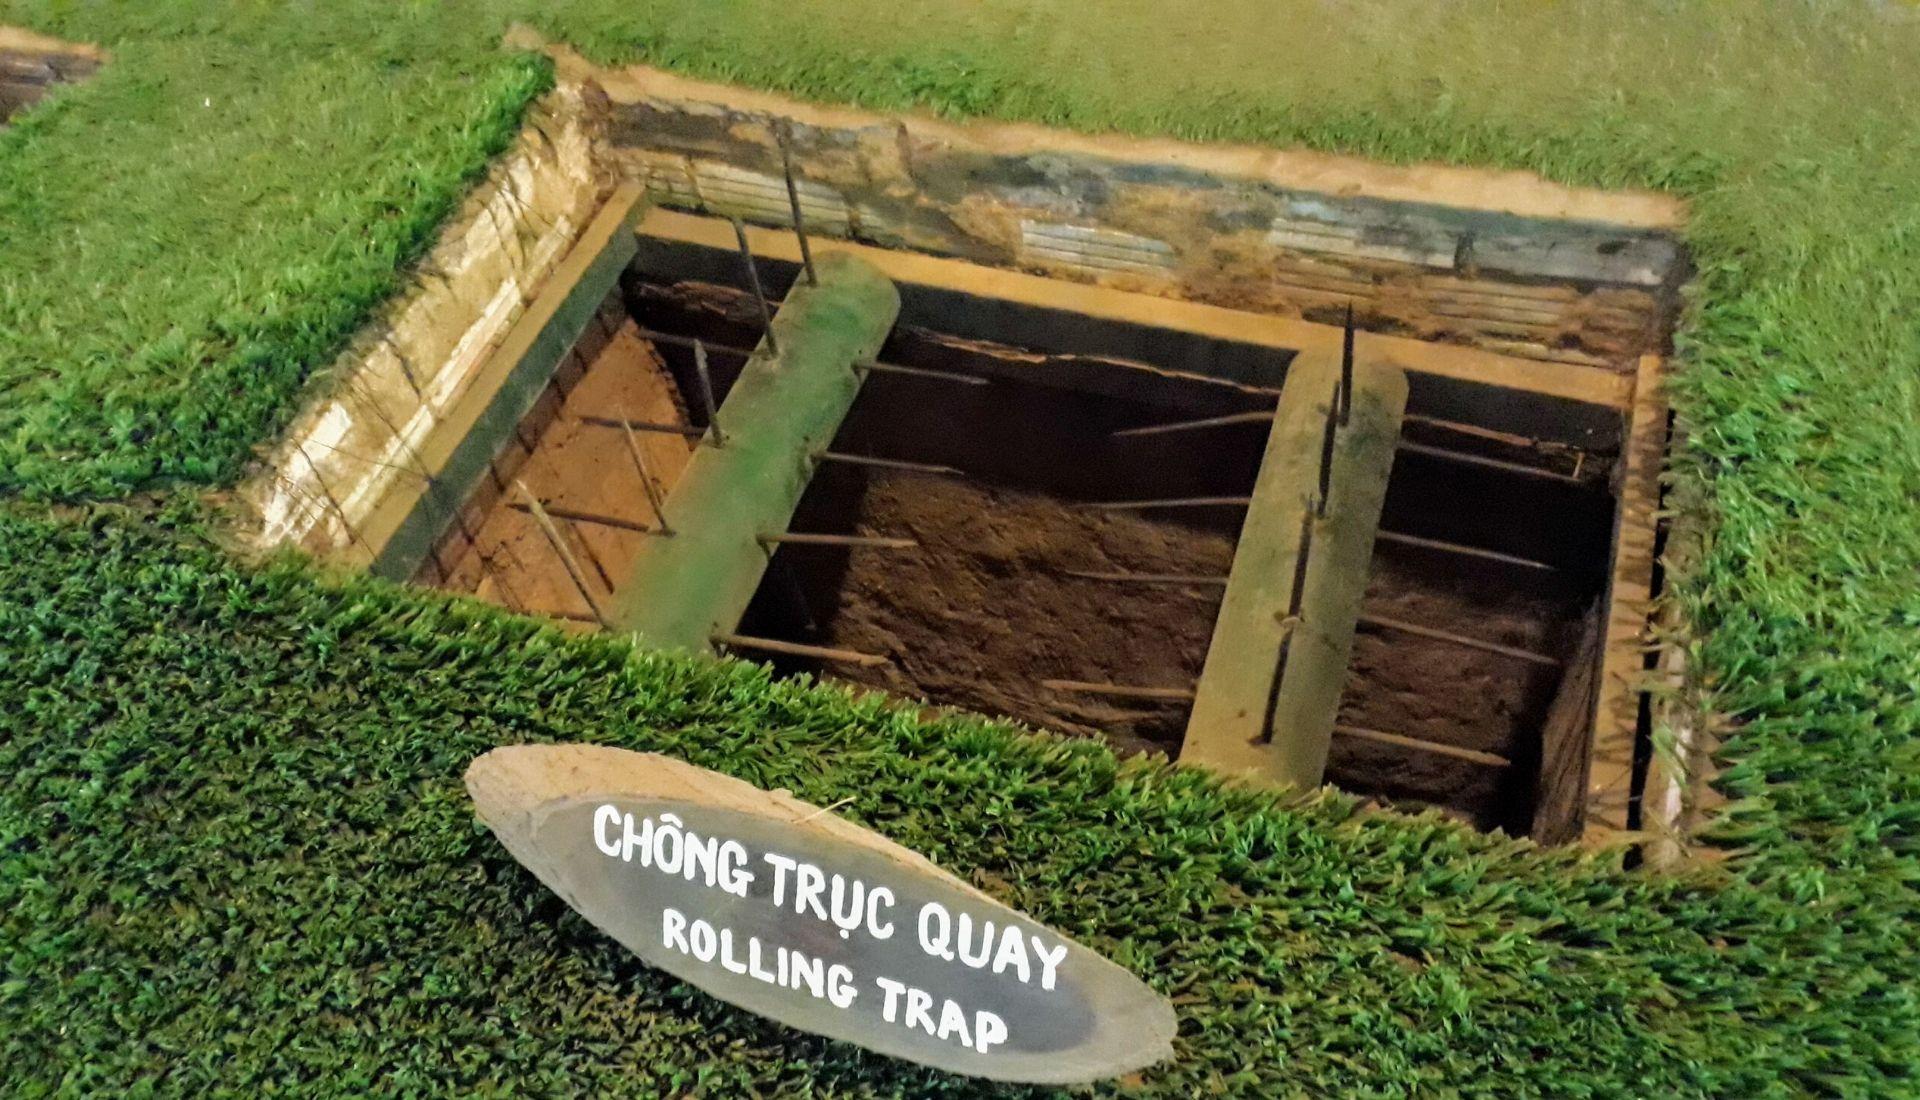 Rolling Trap